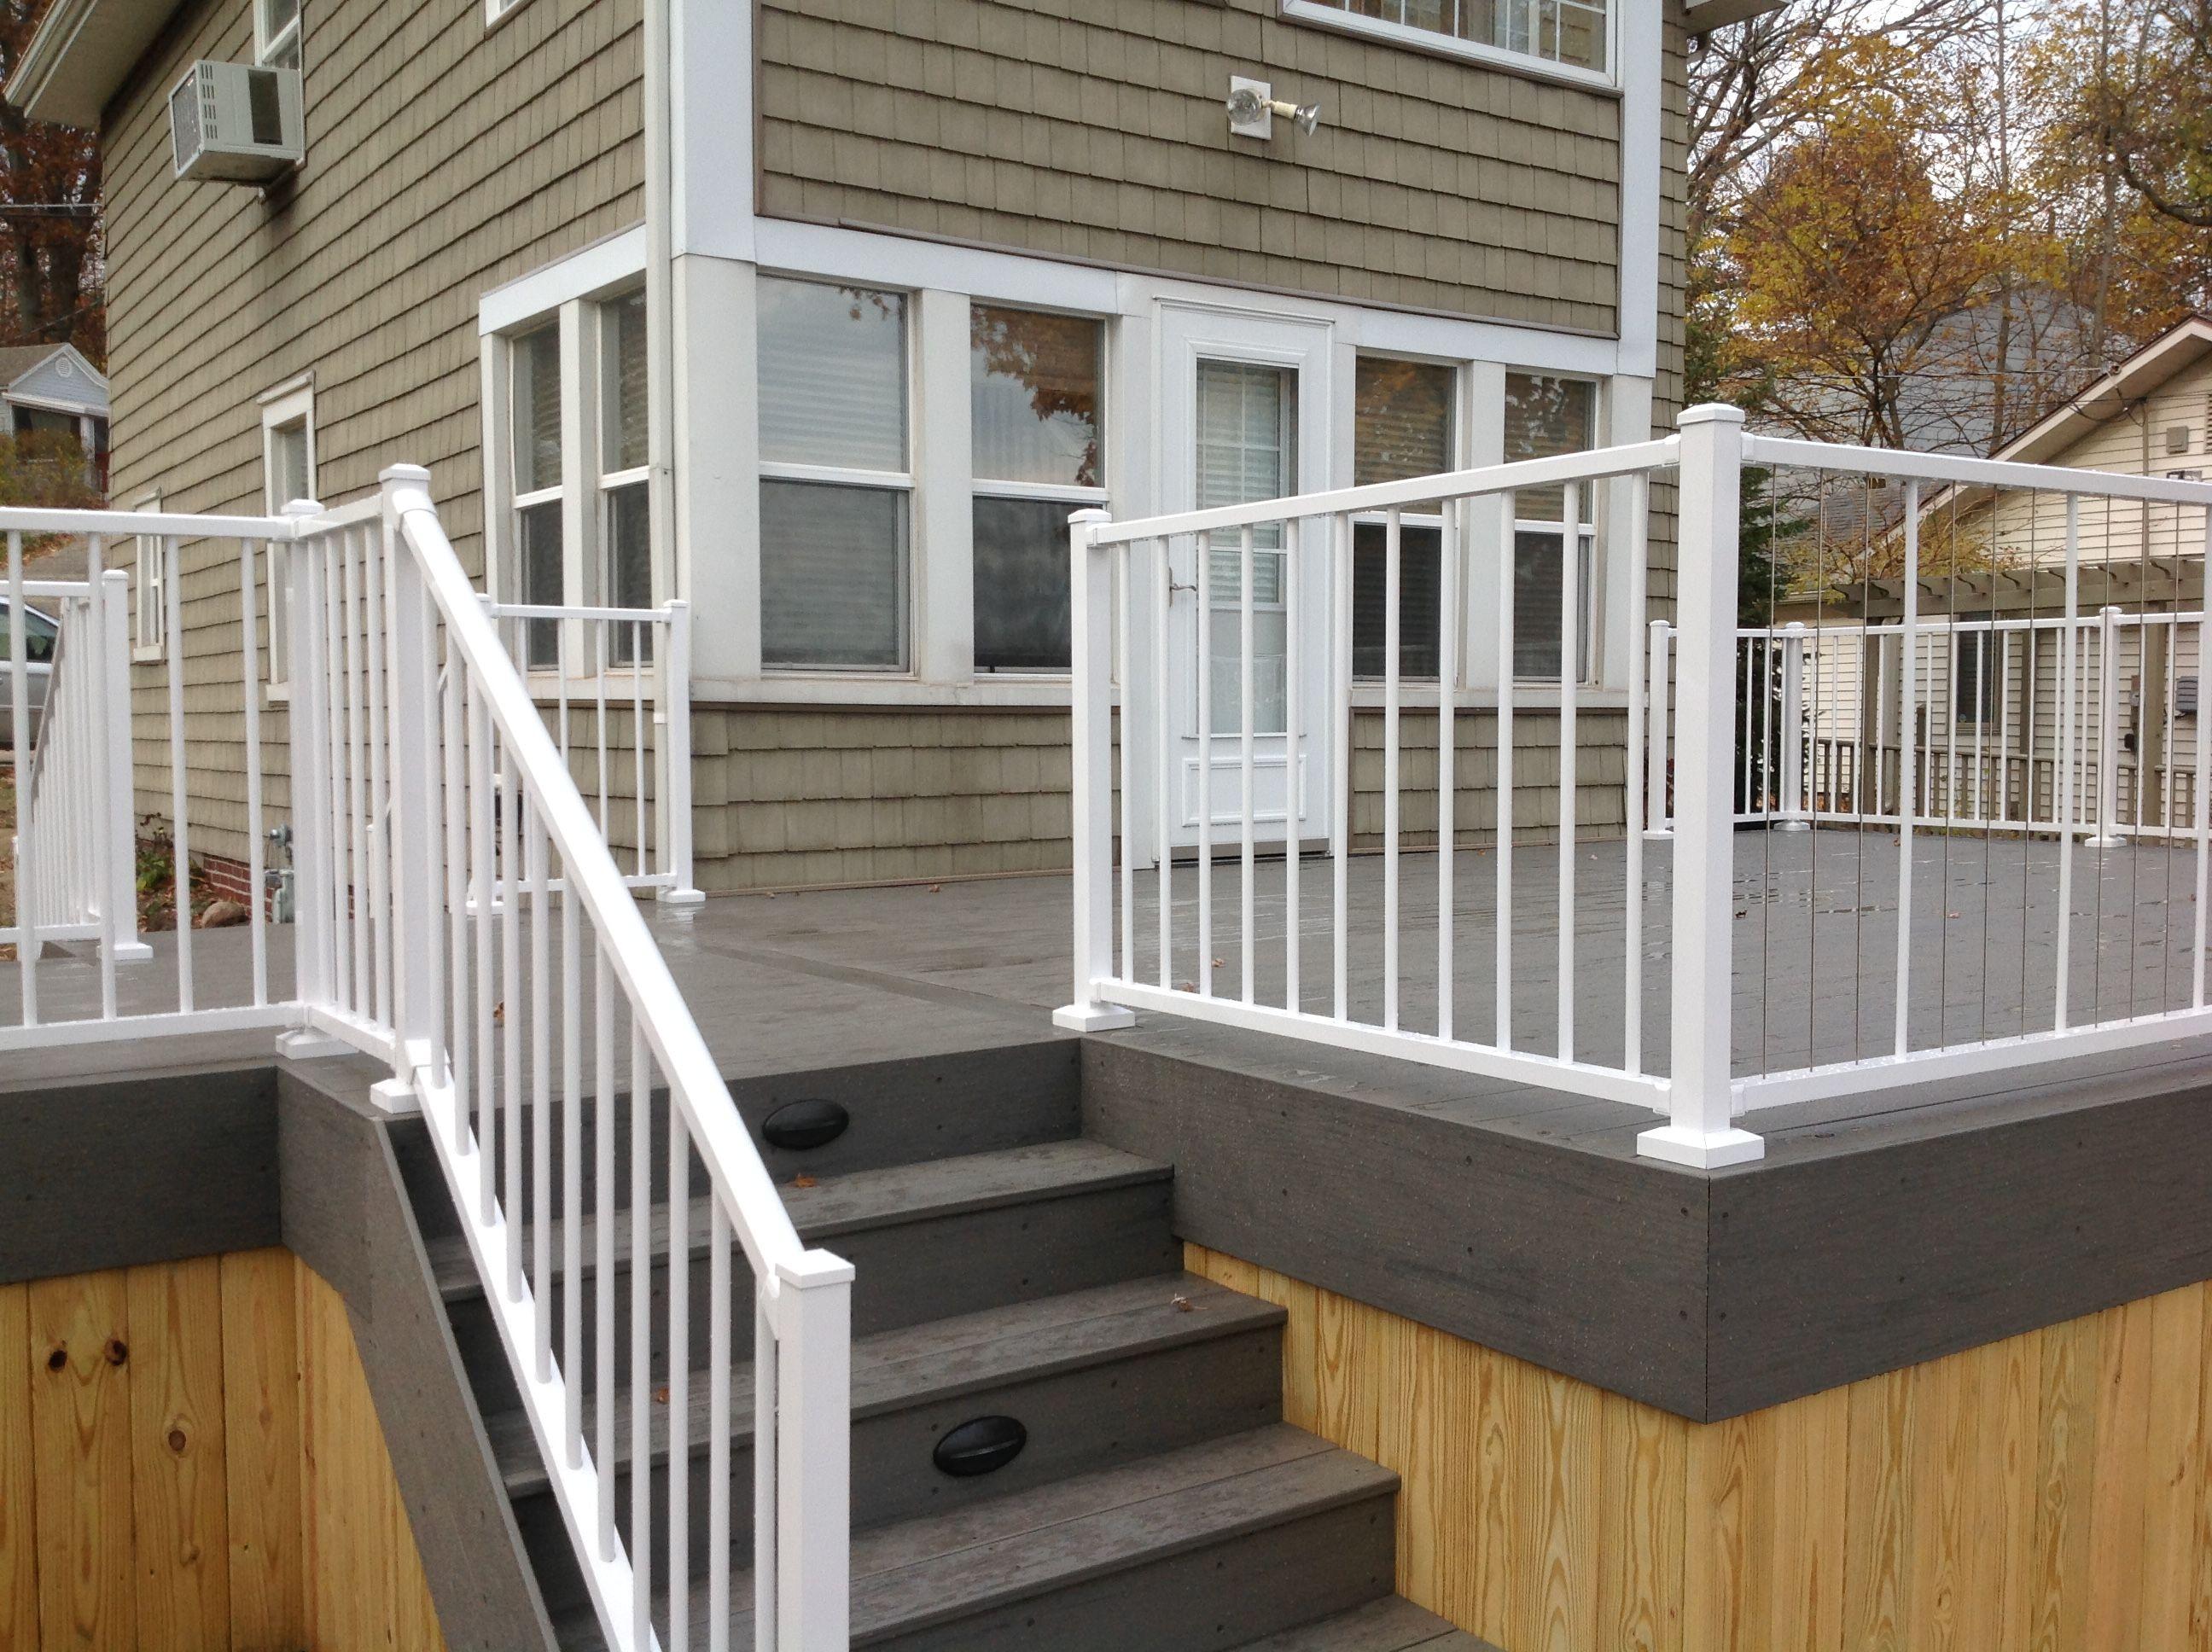 Archadeck Of Fort Wayne Ne Indiana Deck Skirting Porch Design Stone Porches